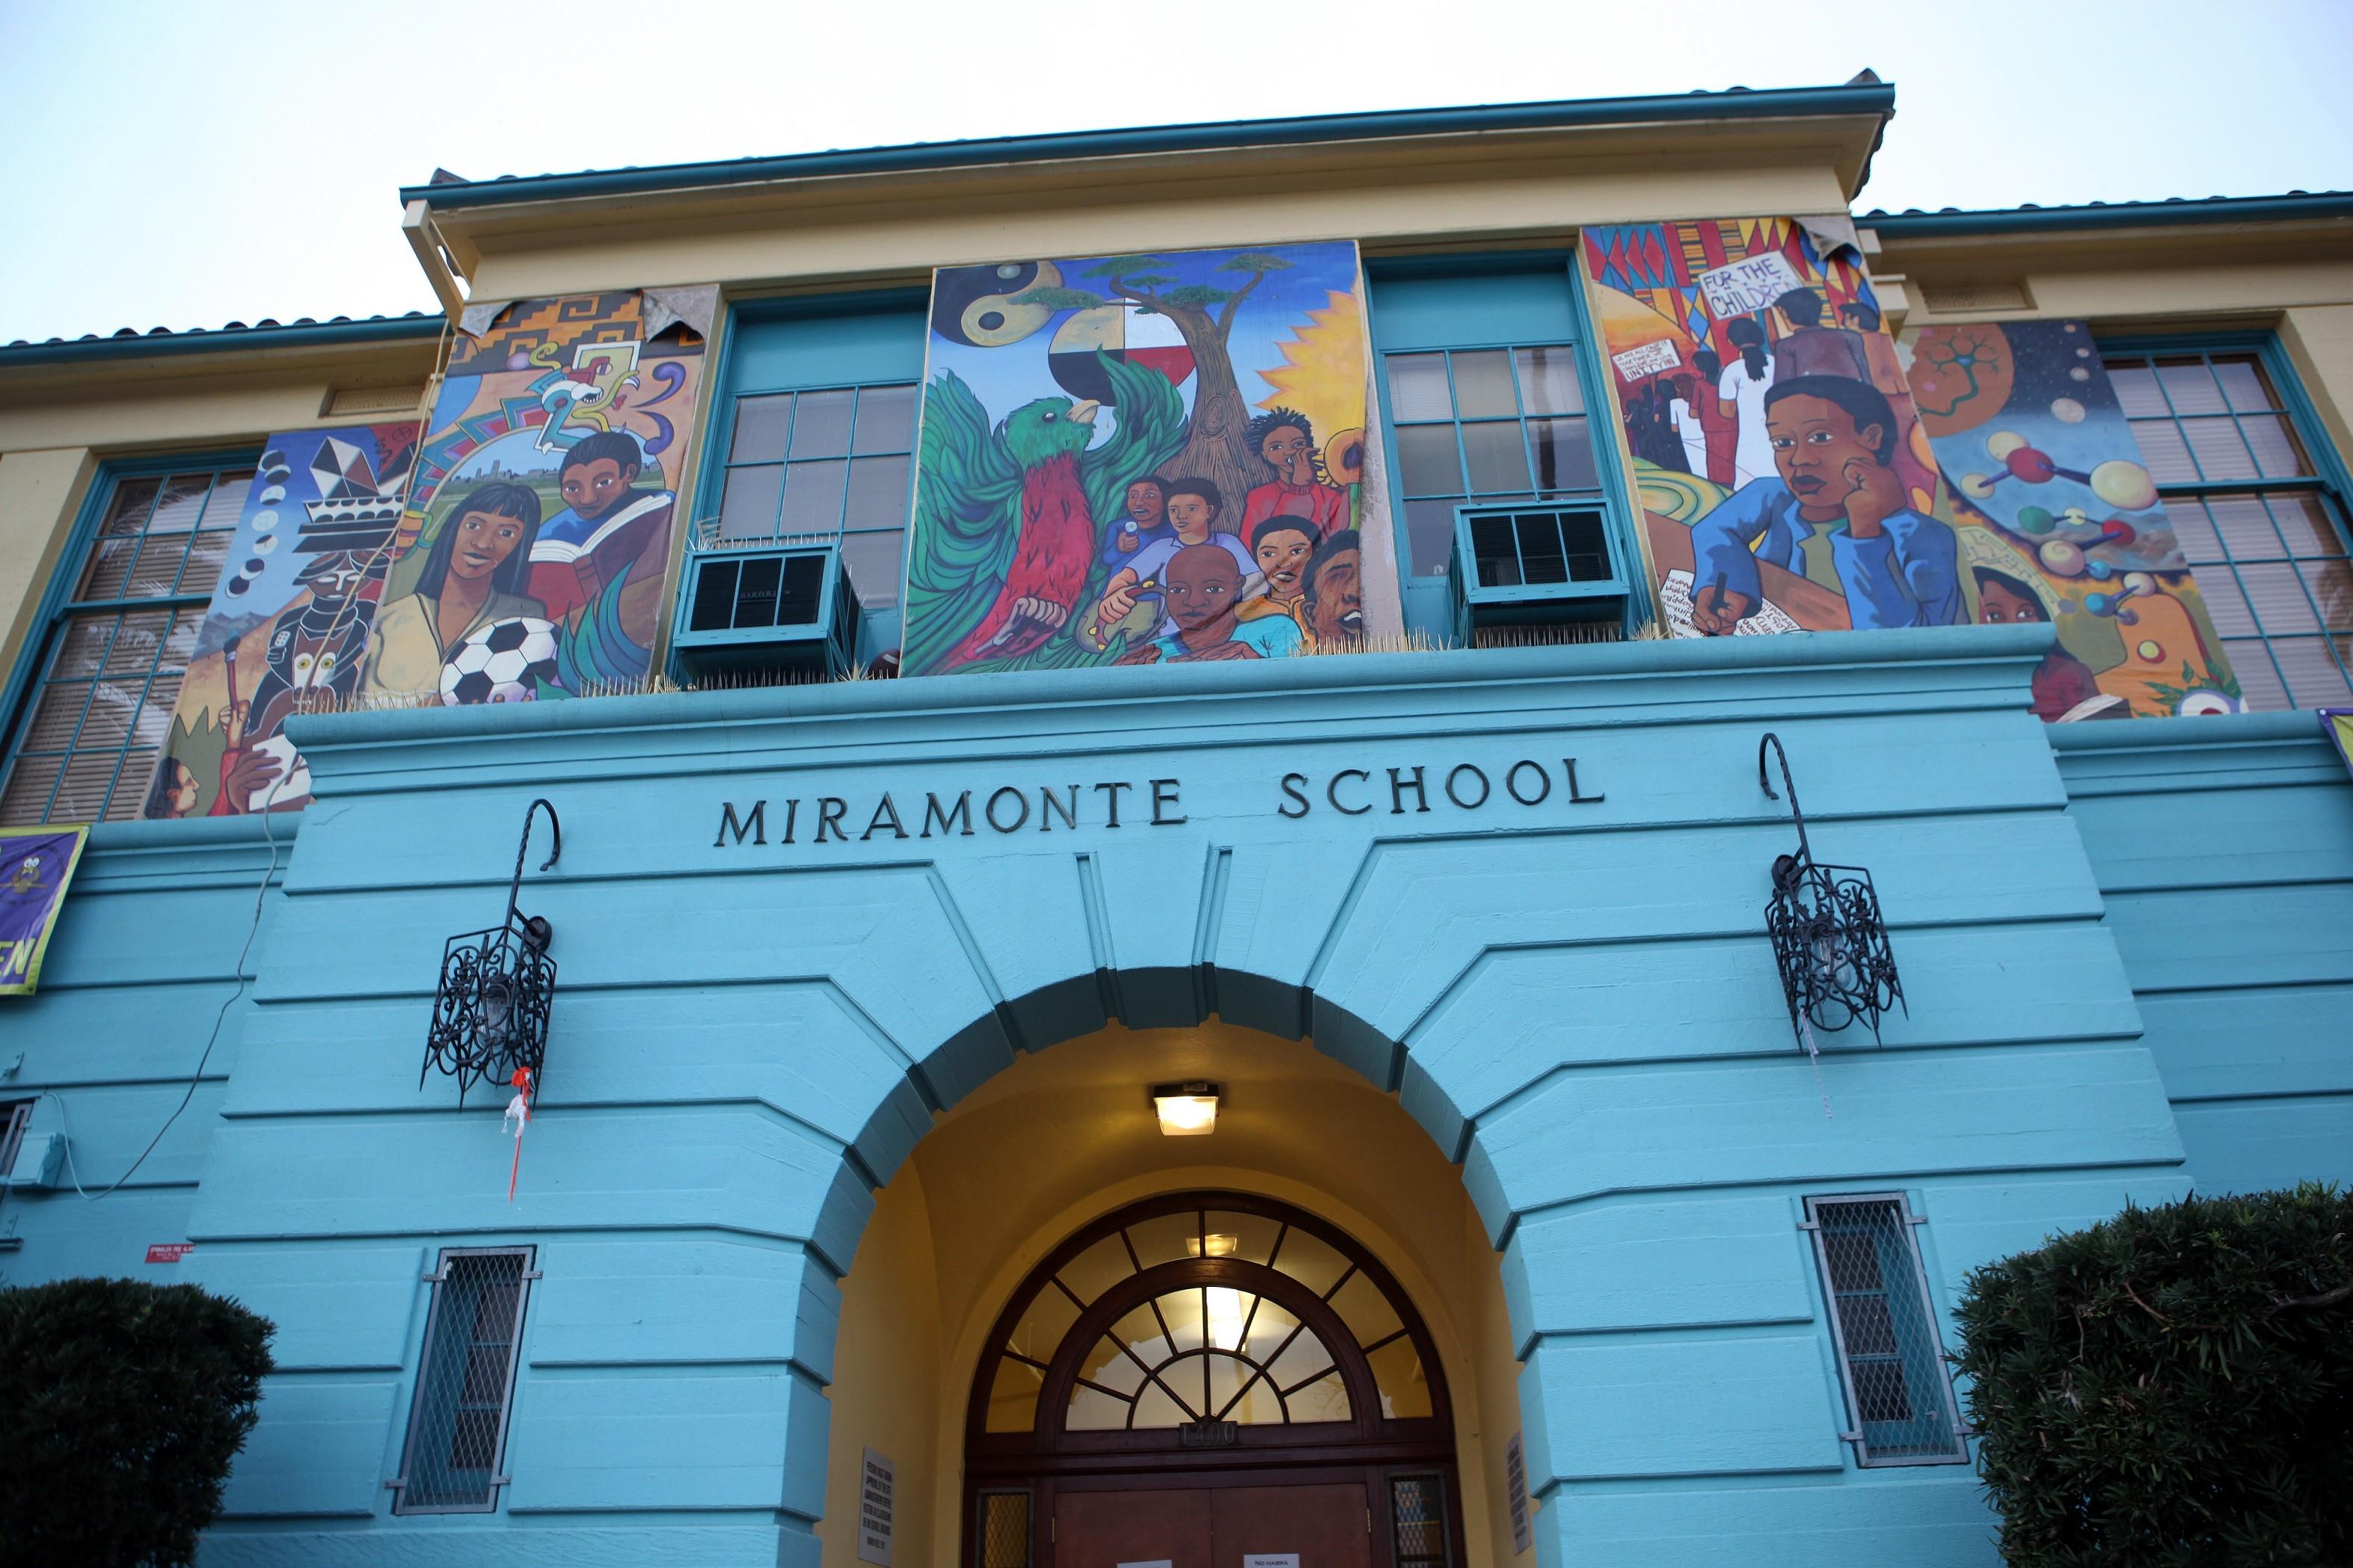 Blue Miramonte Elementary school with murals